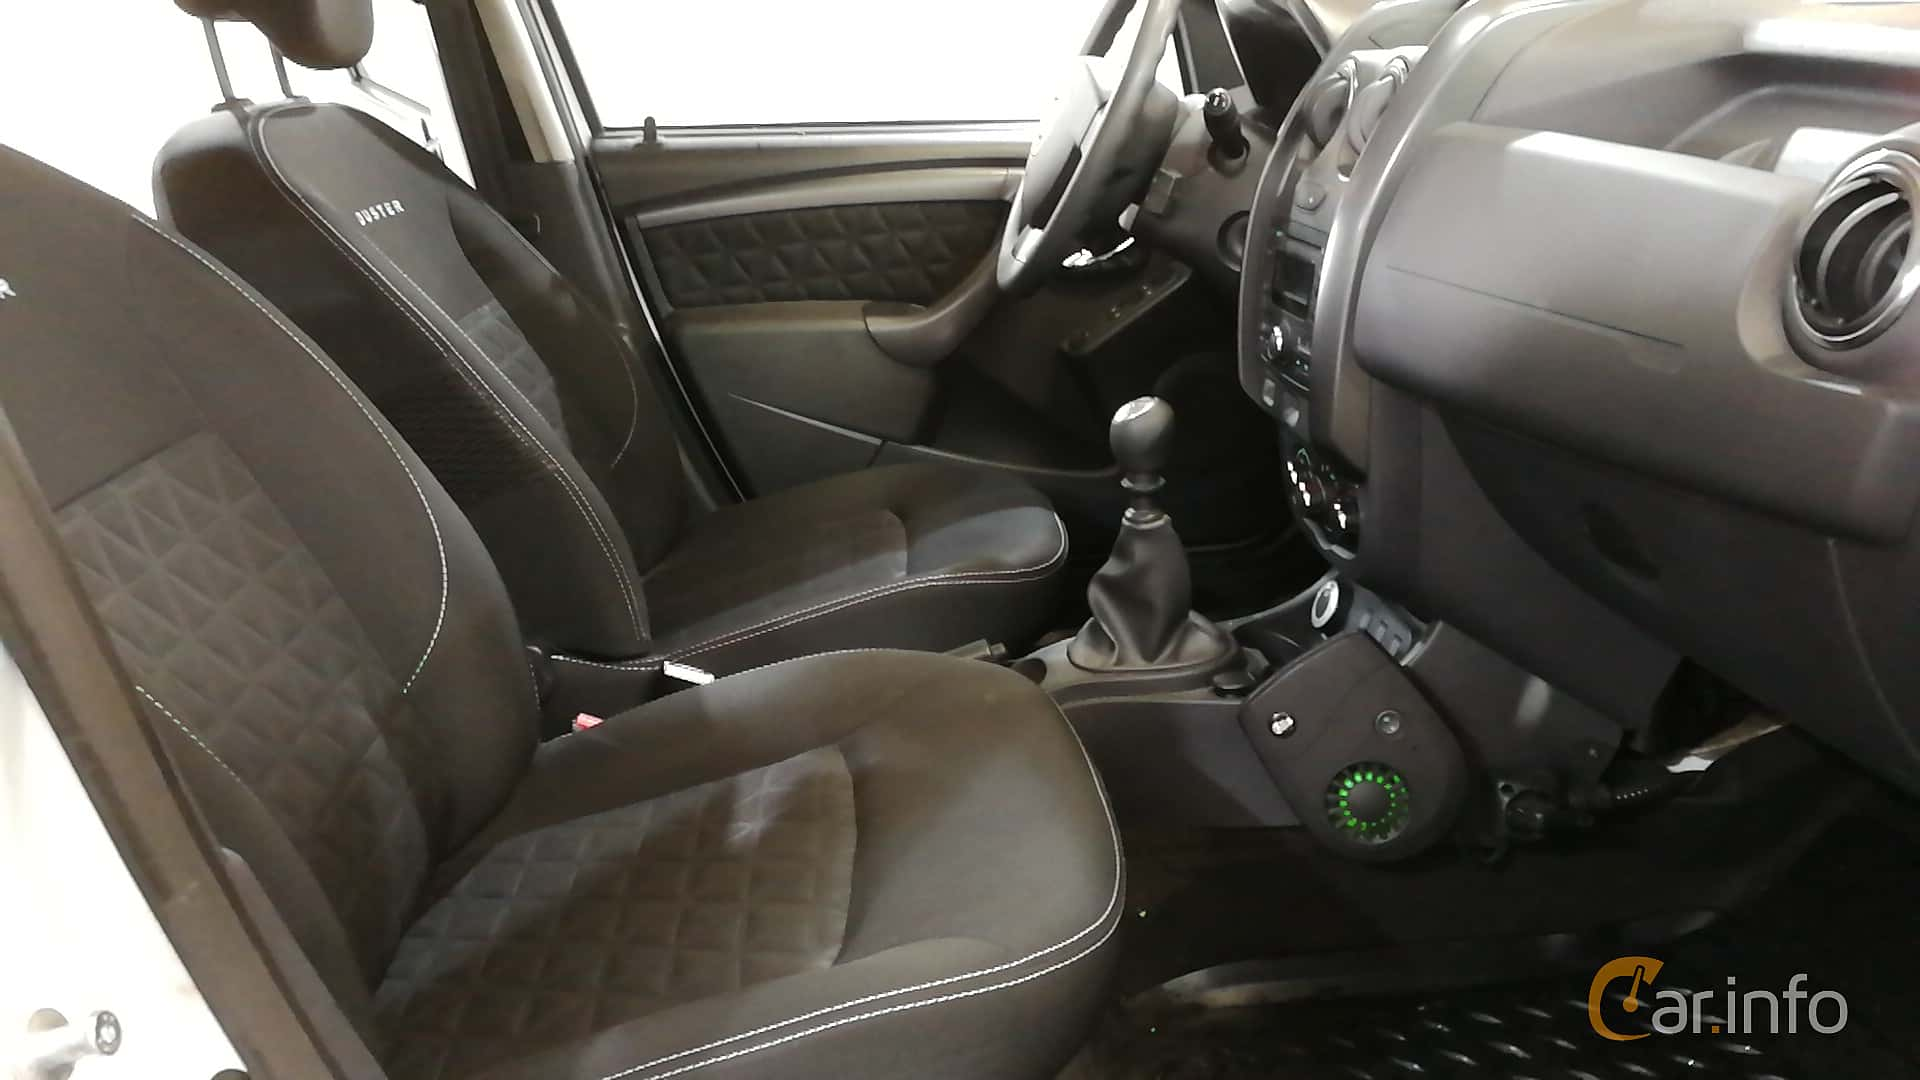 dacia-duster-interior-2-494328.jpg